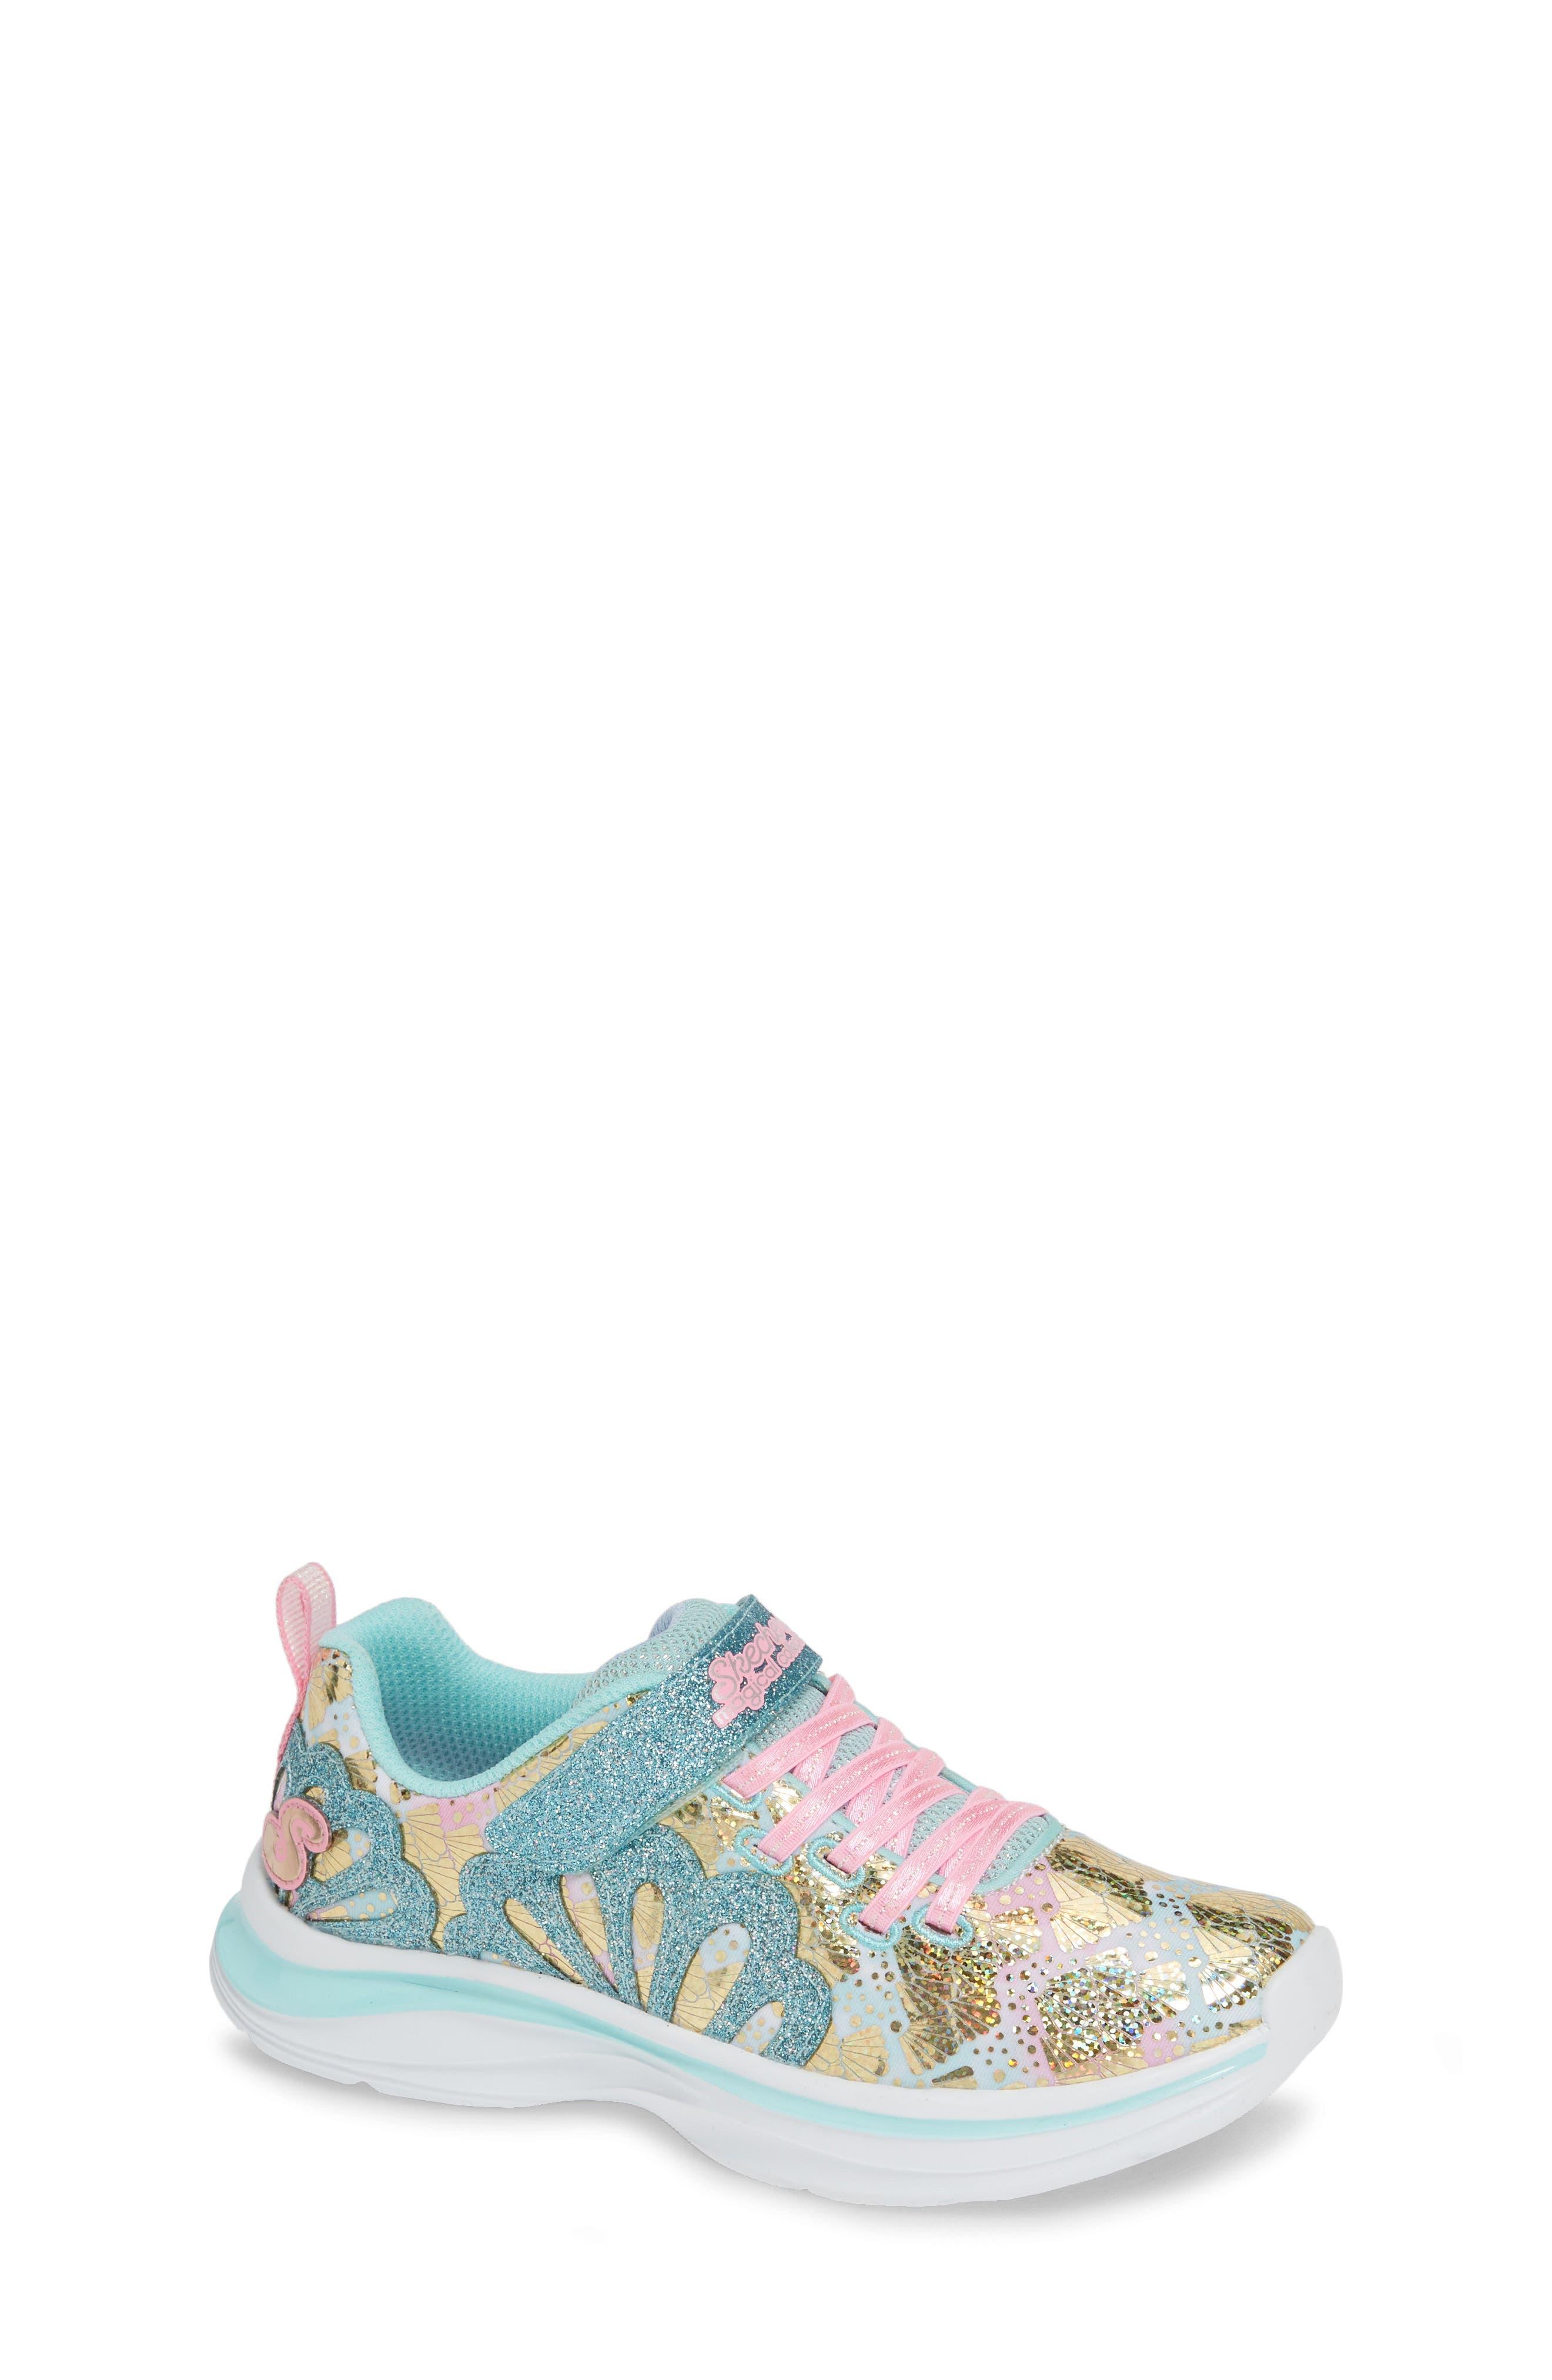 SKECHERS Double Dreams Shimmer Sneaker, Main, color, AQUA/ PINK TEXTILE